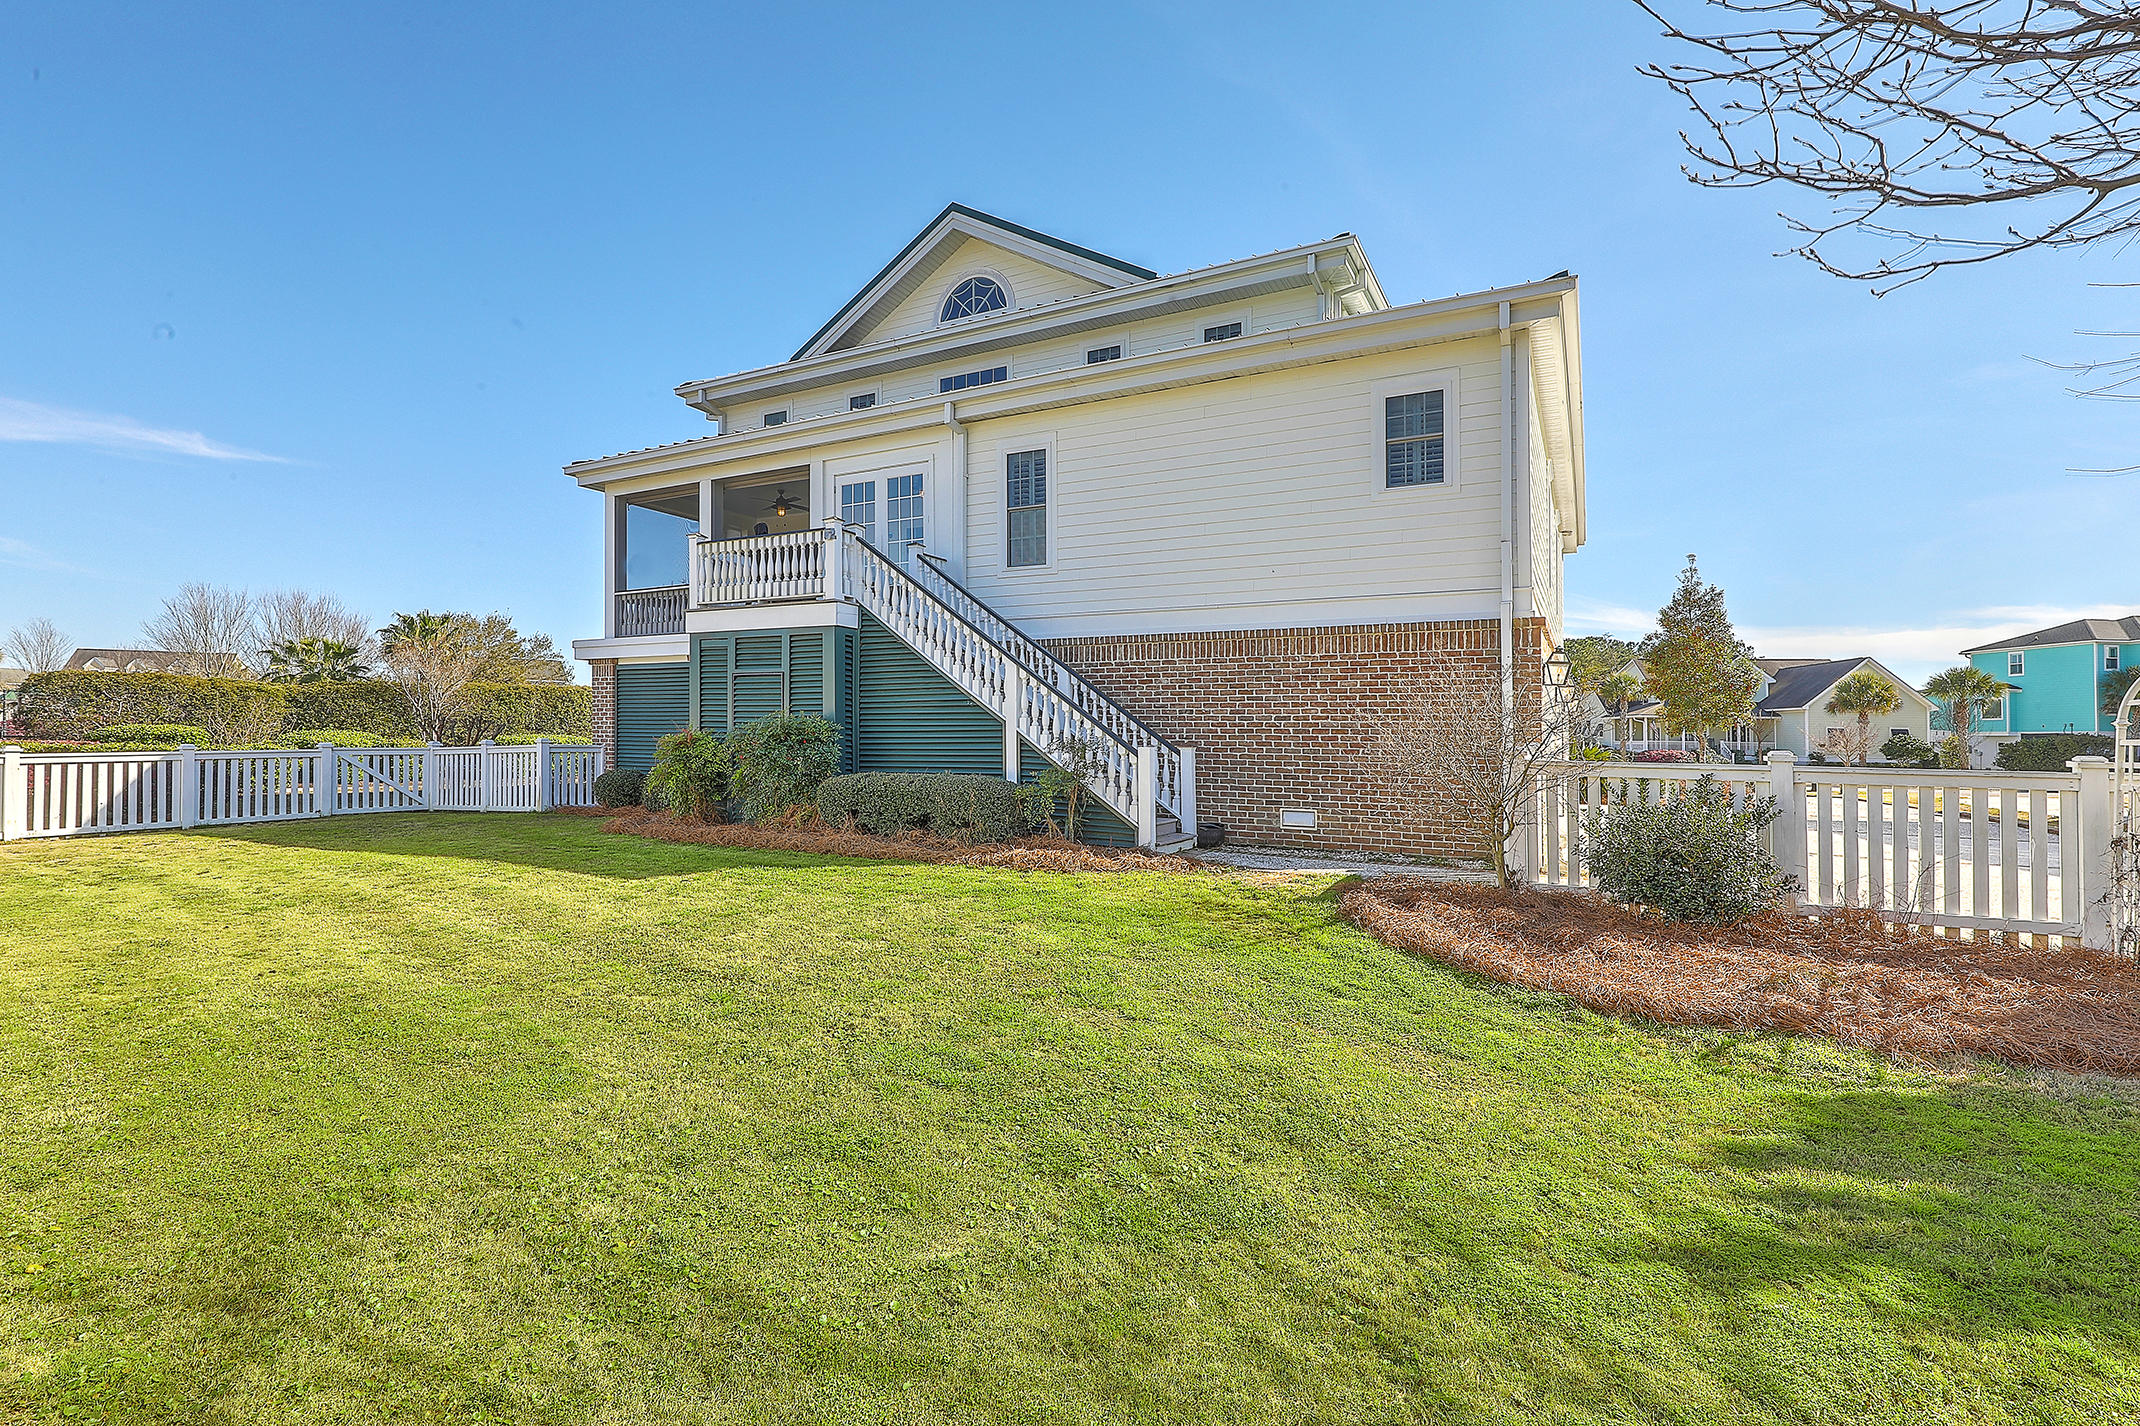 Beresford Creek Landing Homes For Sale - 1410 Creek House, Charleston, SC - 9